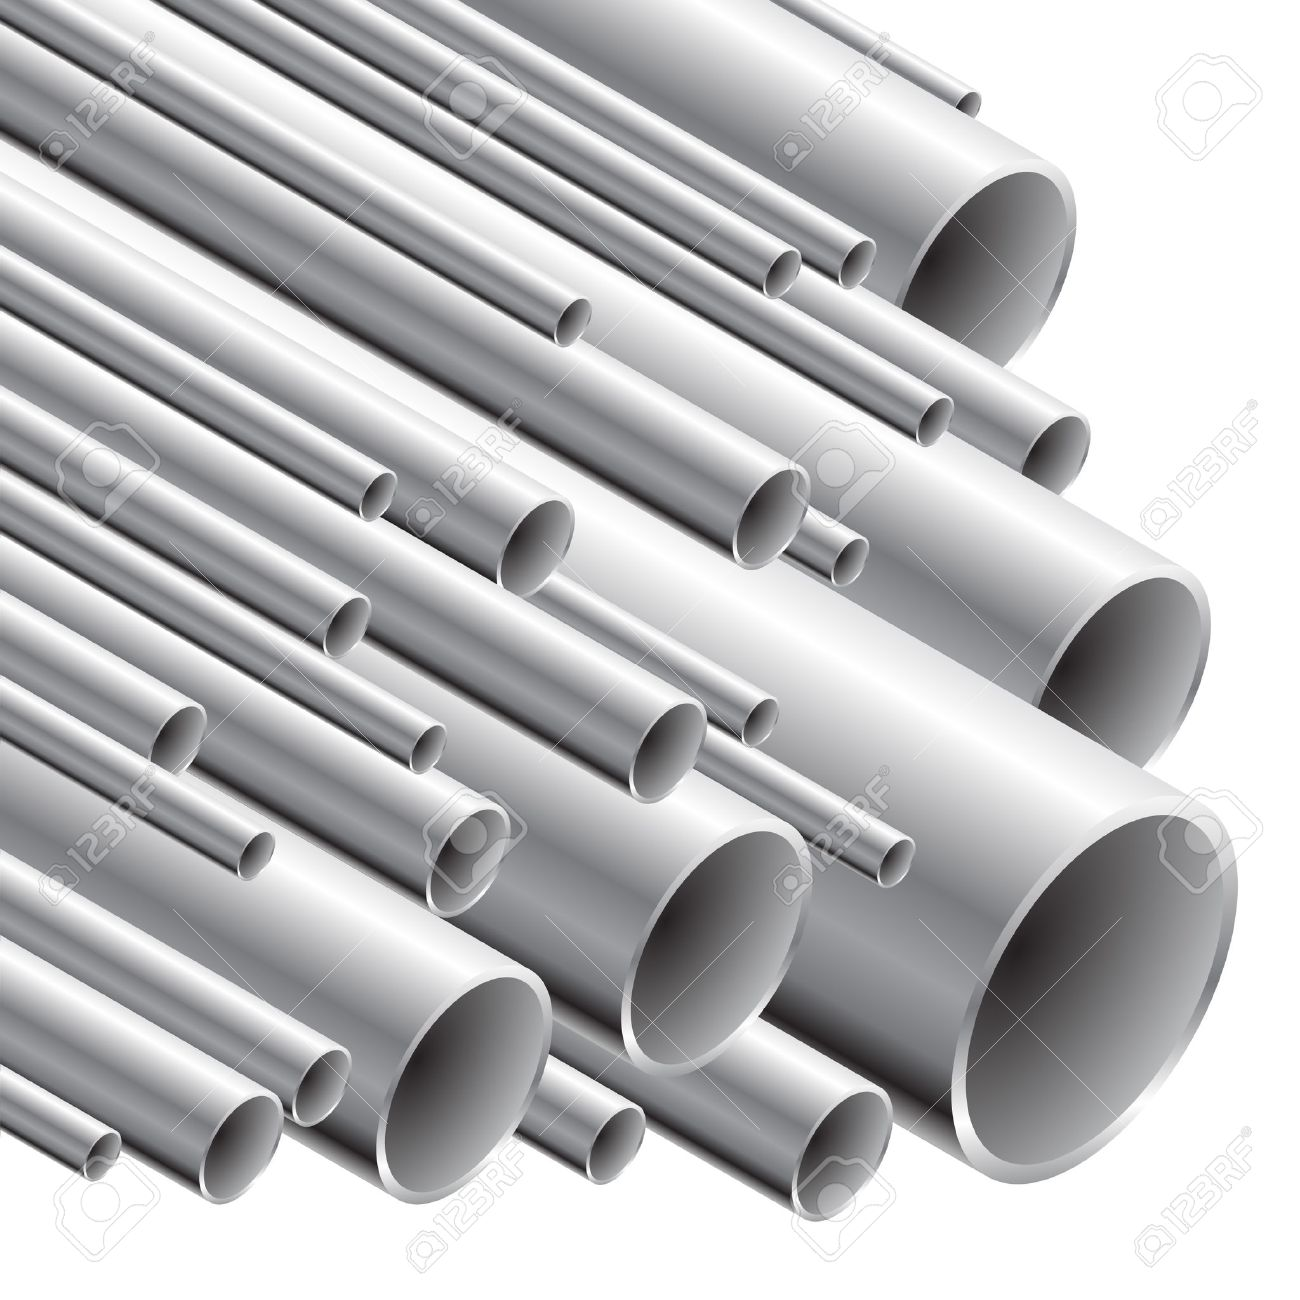 Stack of steel tubing (vector illustration). - 6419000